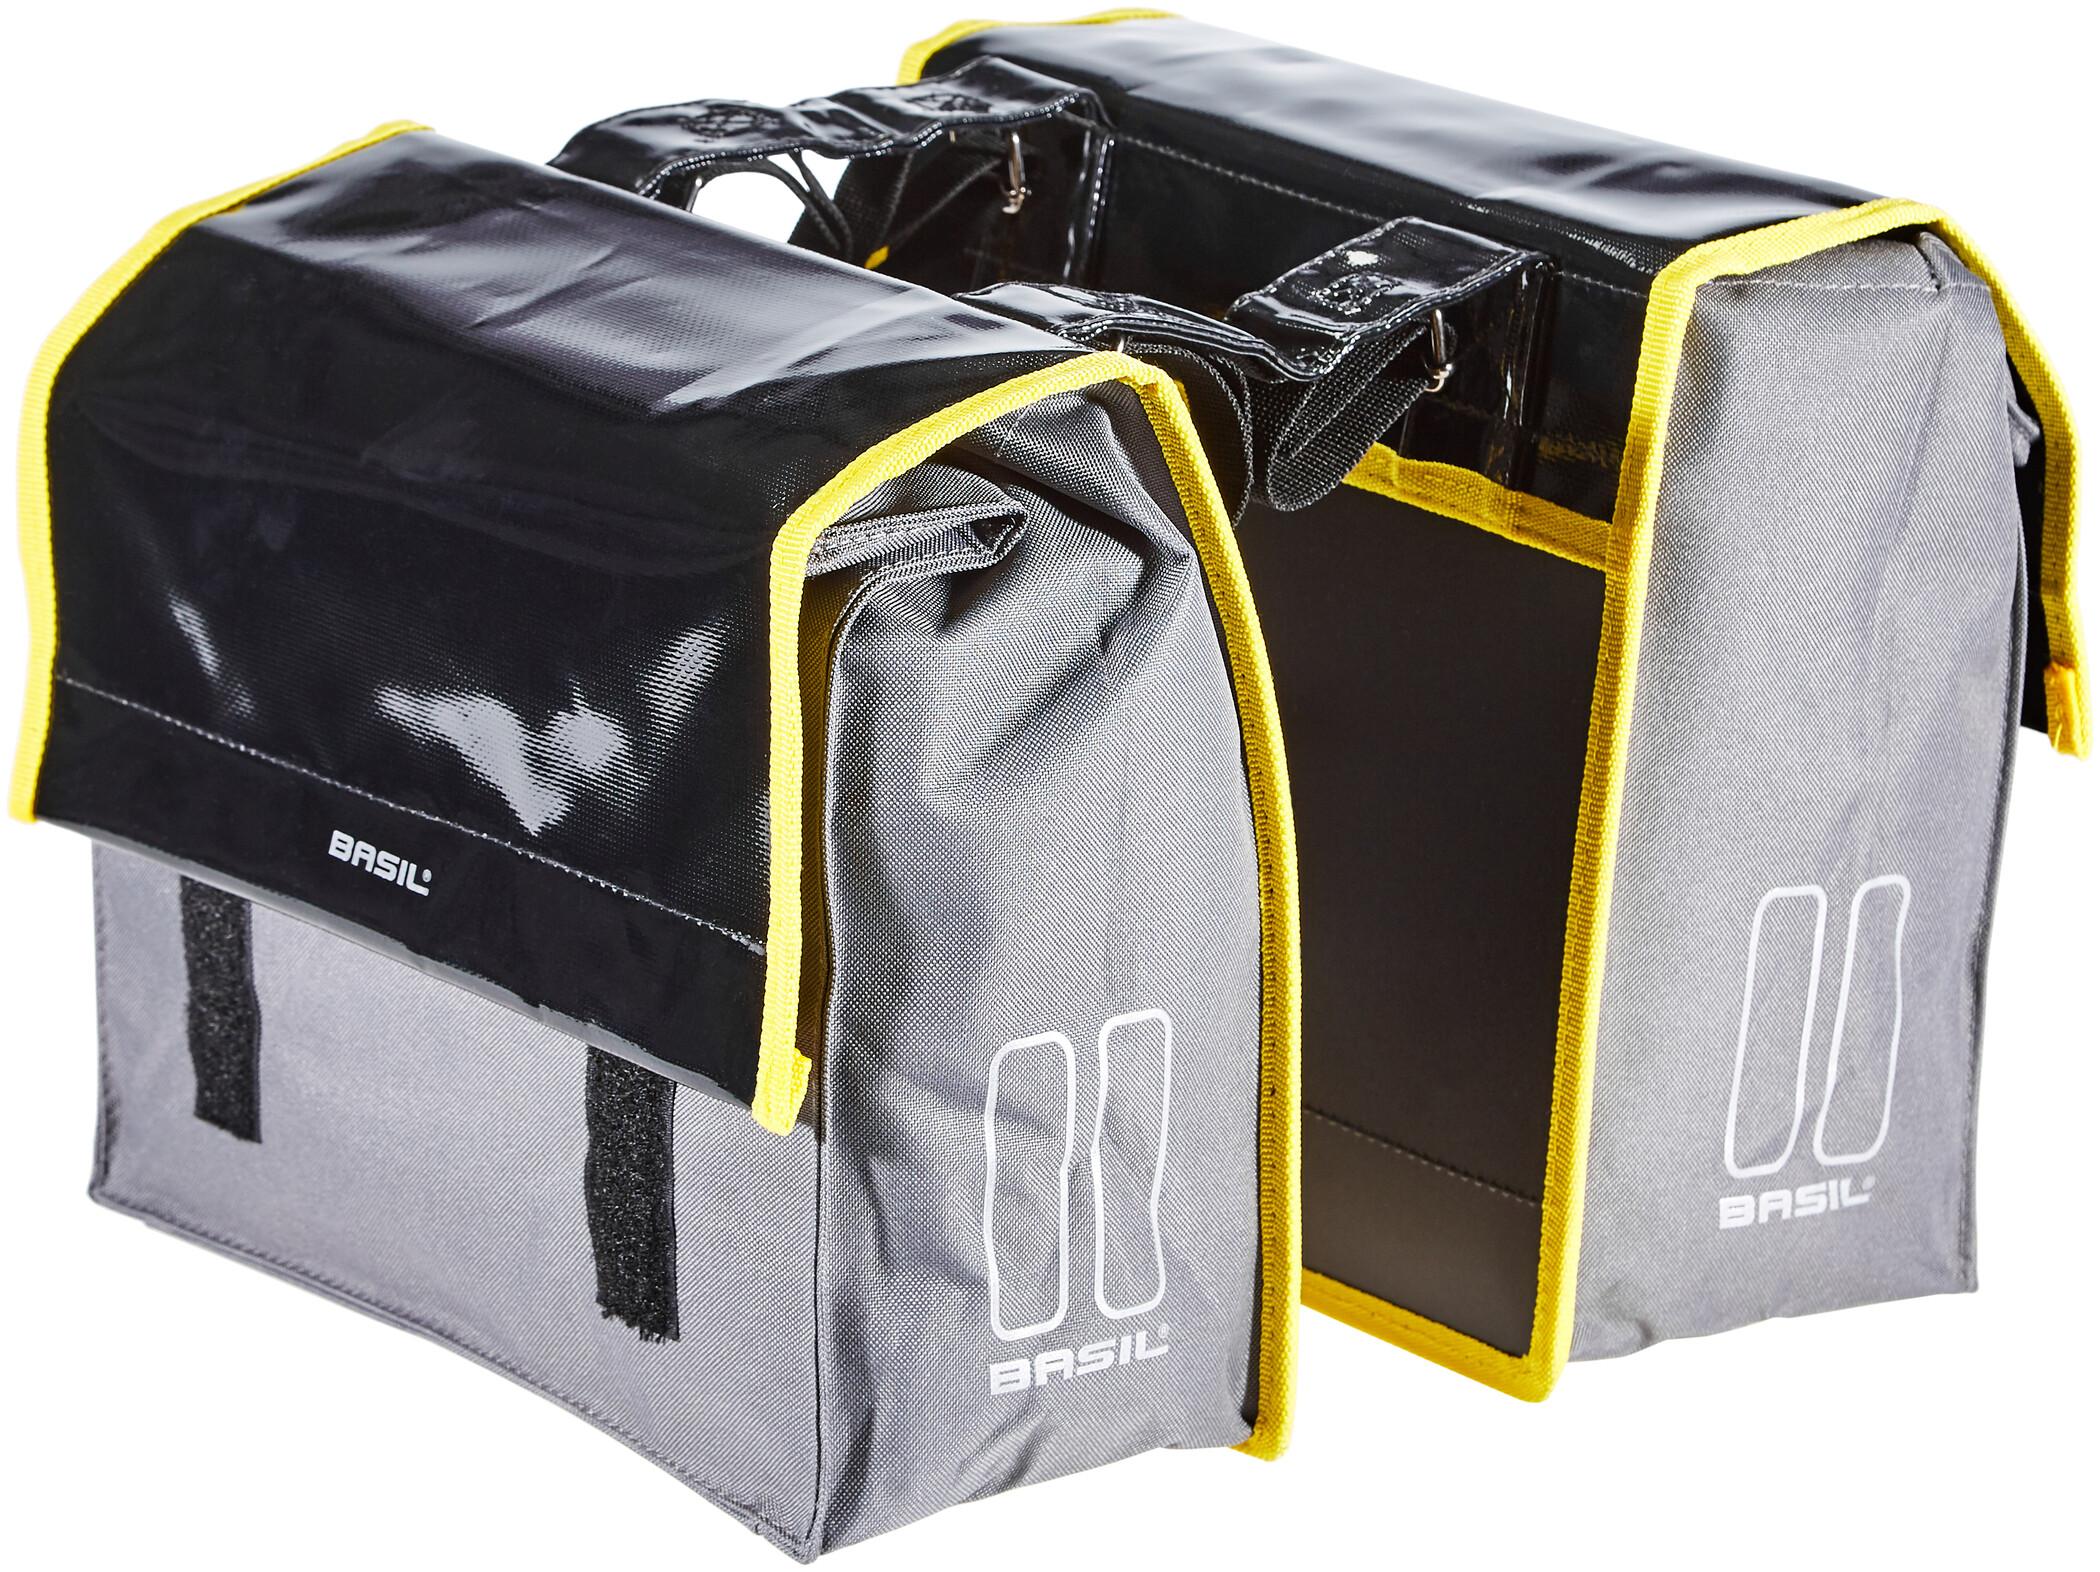 Basil Urban Load S Sidetasker 25l, black/steel grey (2020) | Rack bags